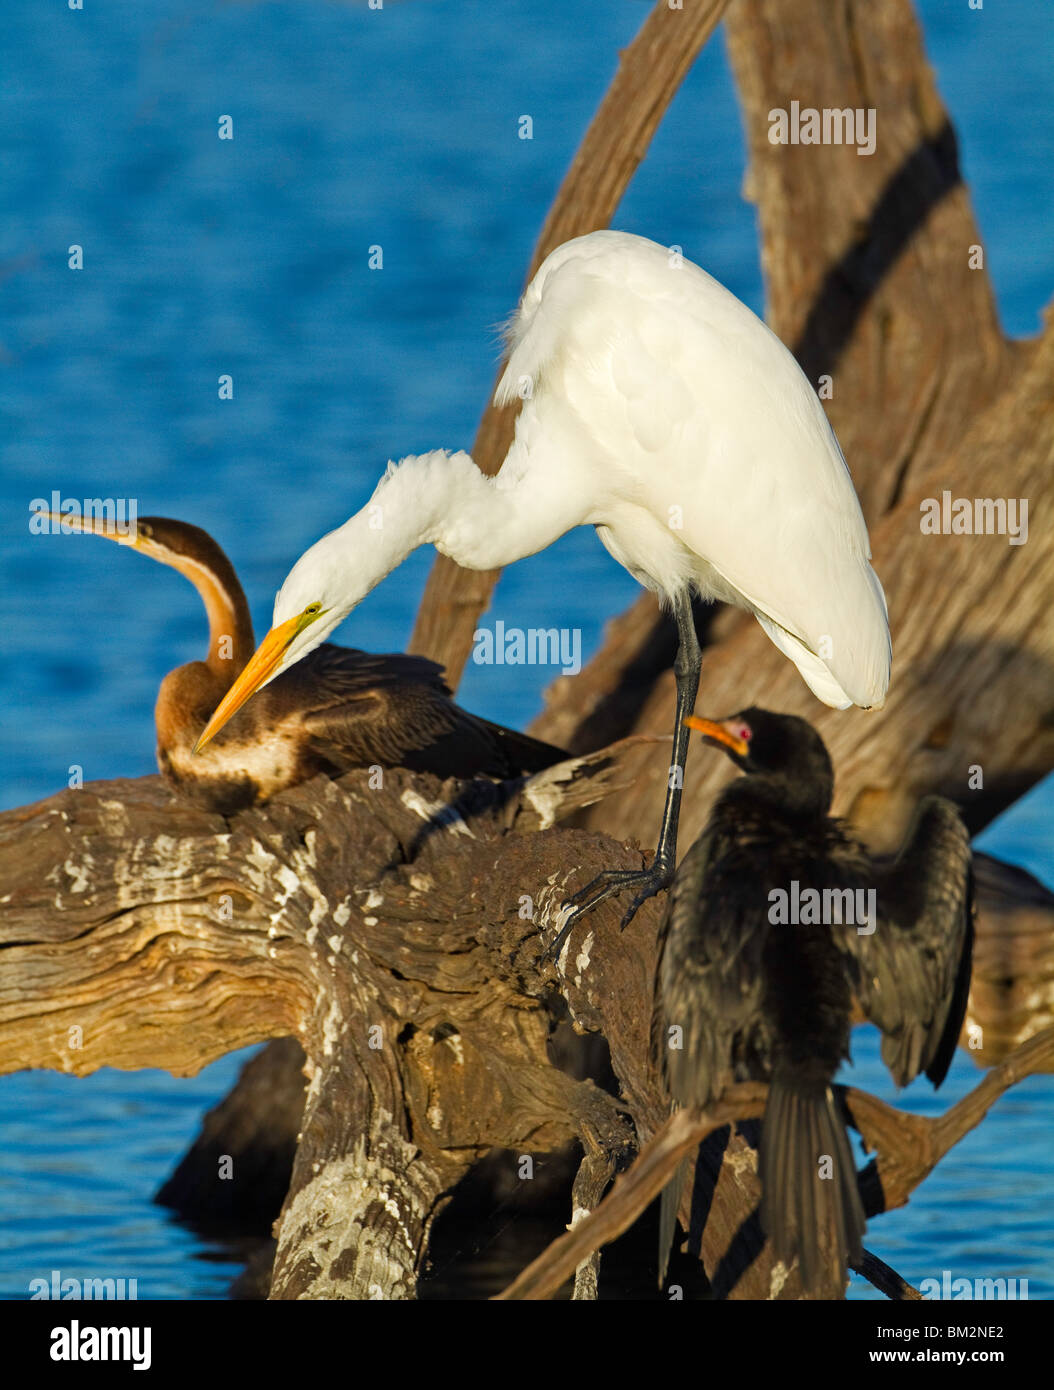 waterbirds - Stock Image